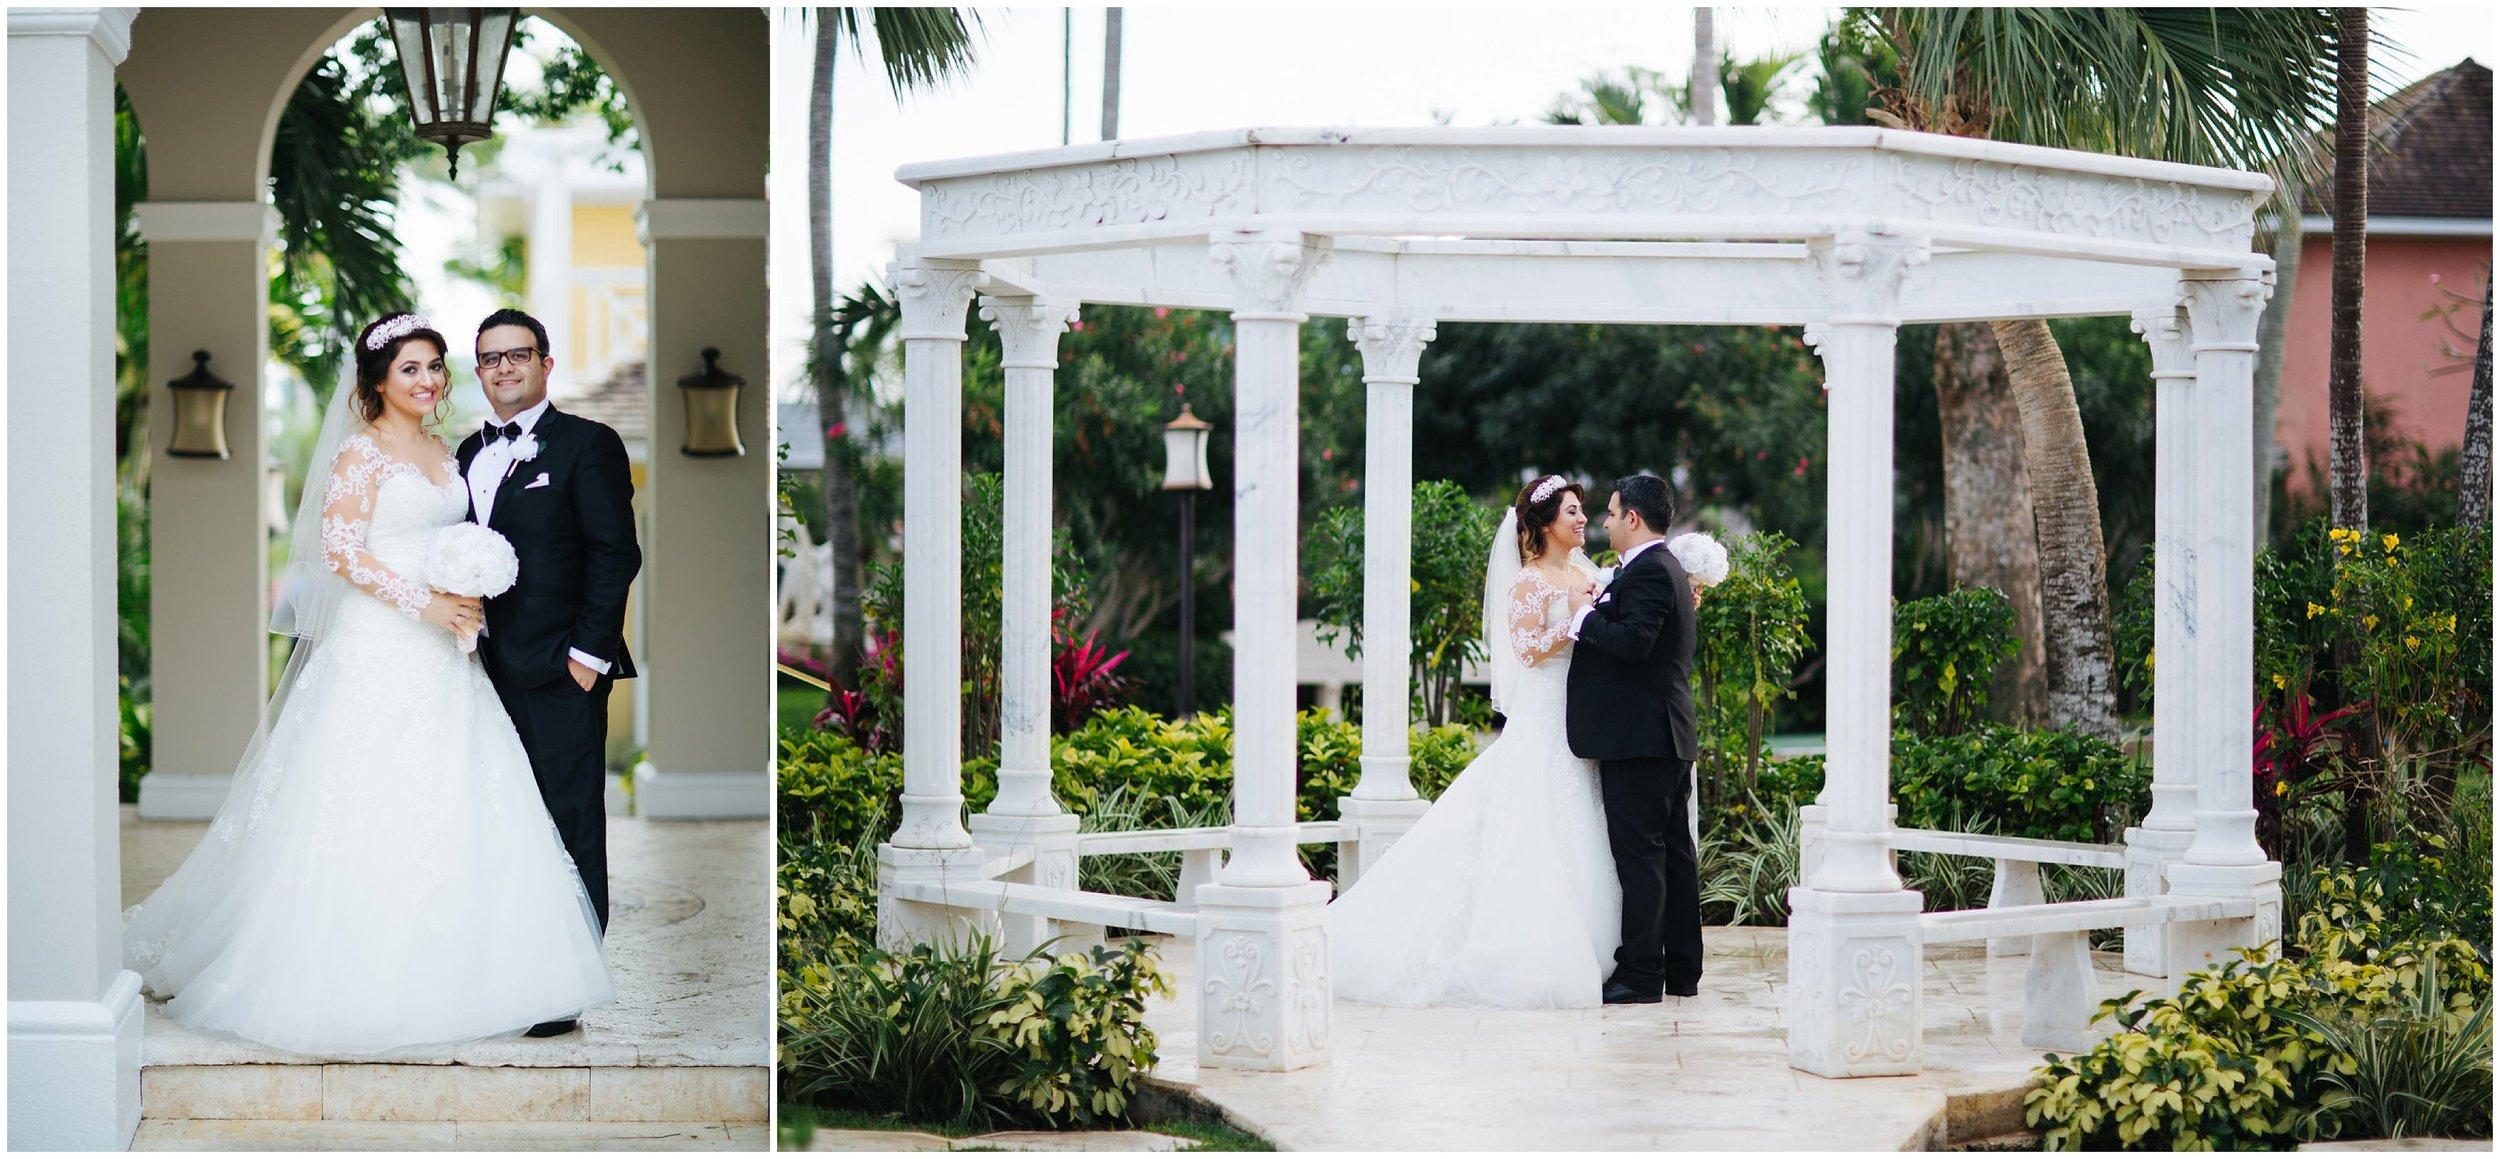 Le Cape Weddings- Destination Wedding Photography -ShayanandNikkie-297-X3_LuxuryDestinationPhotographer.jpg